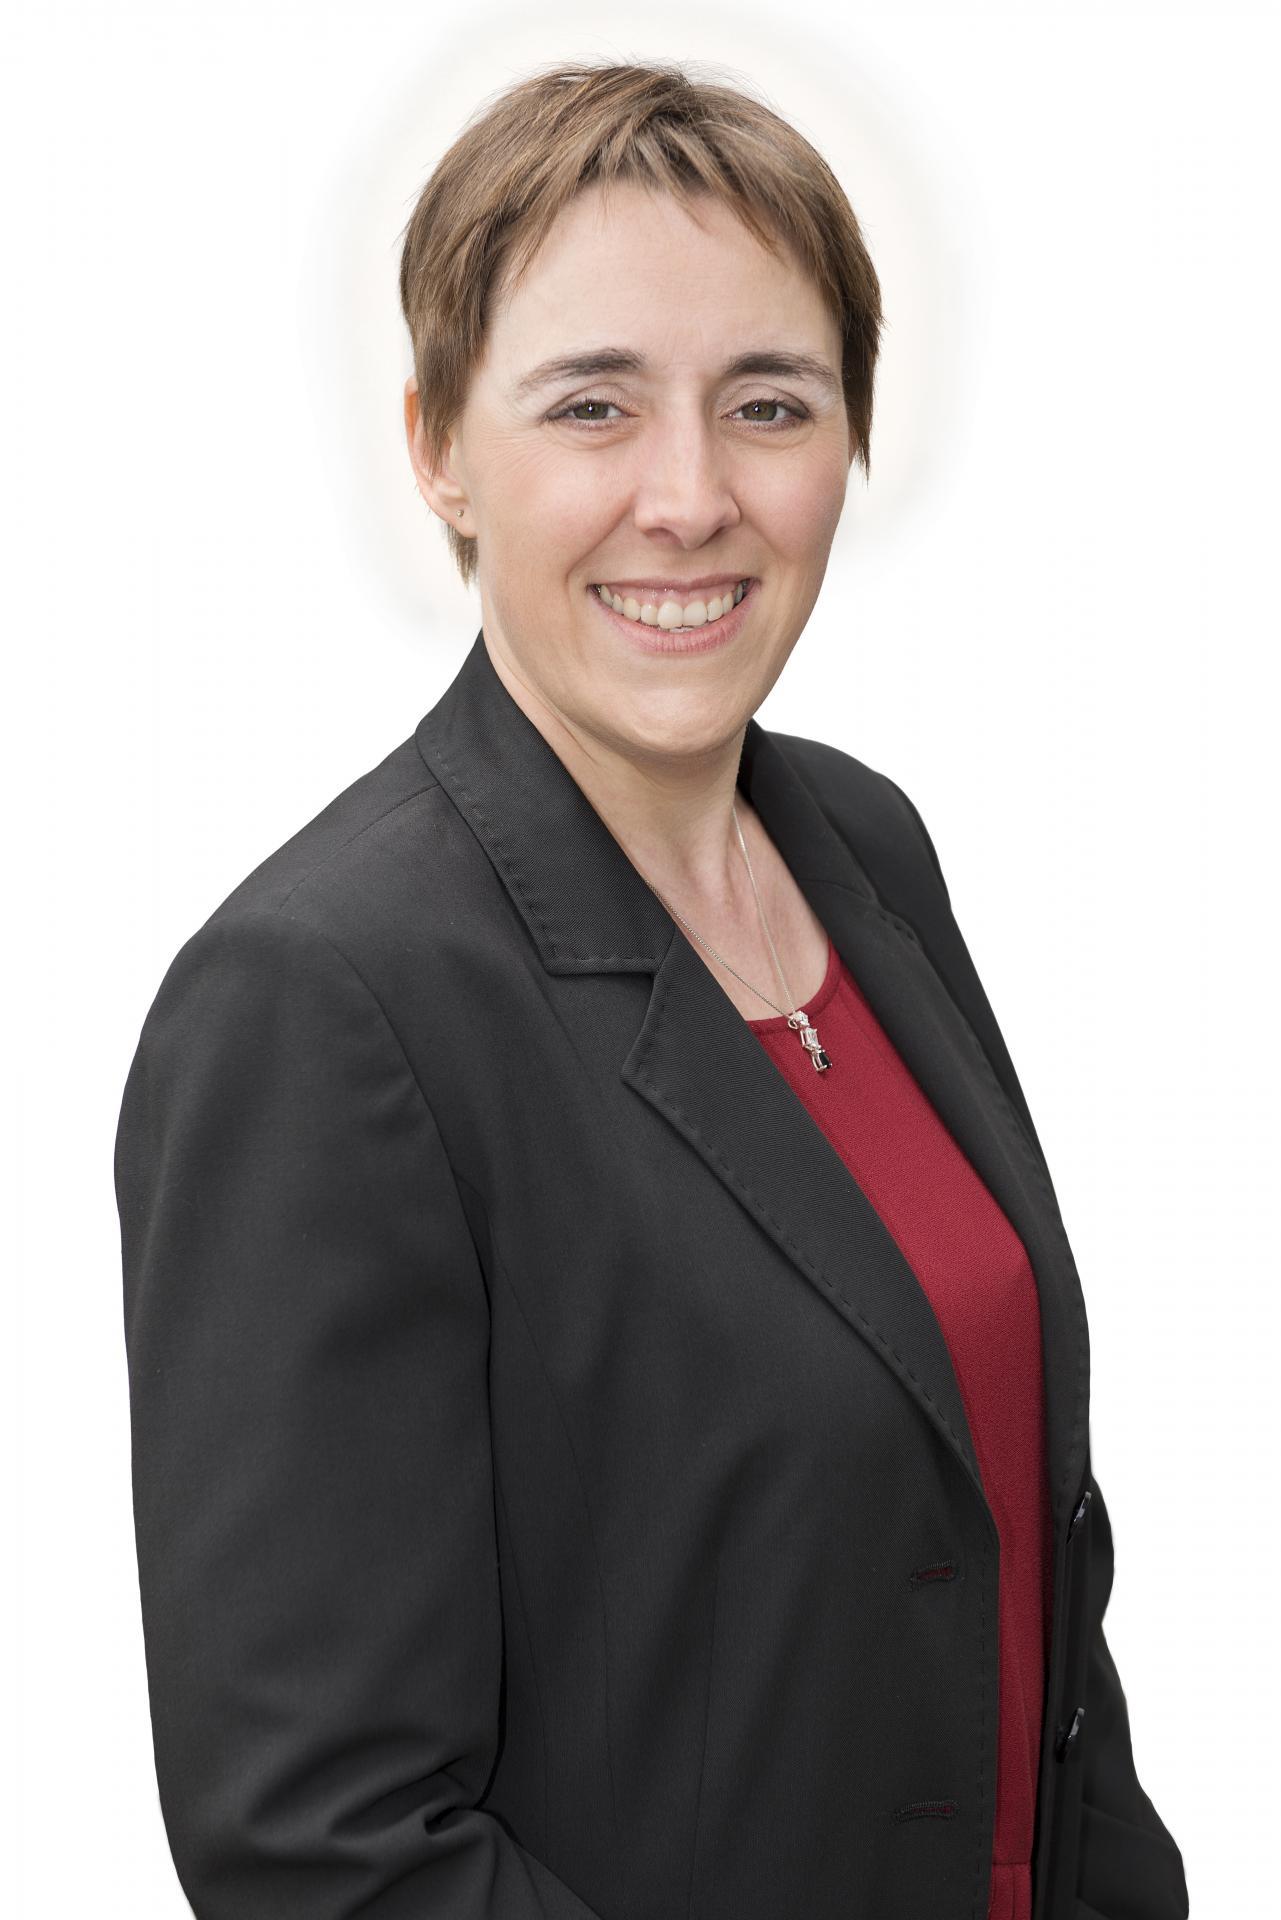 Bürgermeisterin Kirsten Frömel